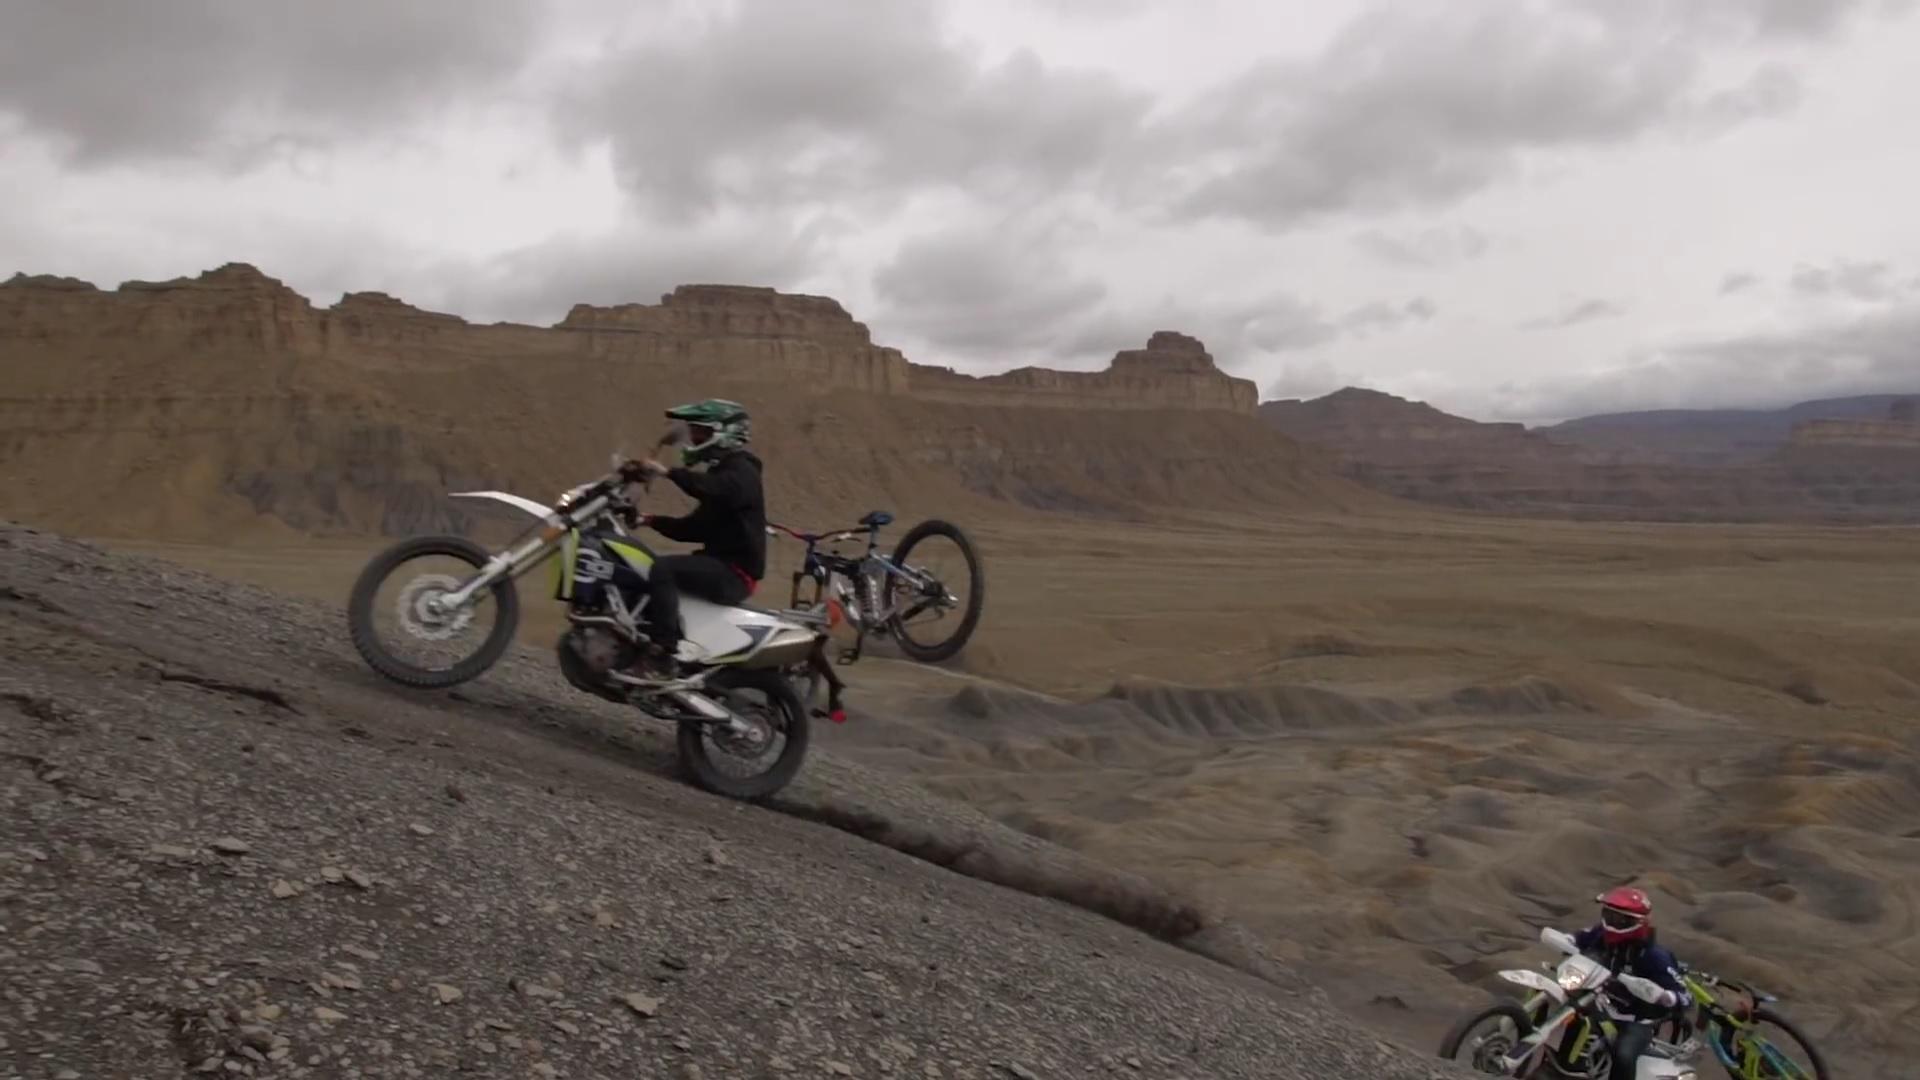 Moto + MTB = The Best Way To Mountain Bike In Utah